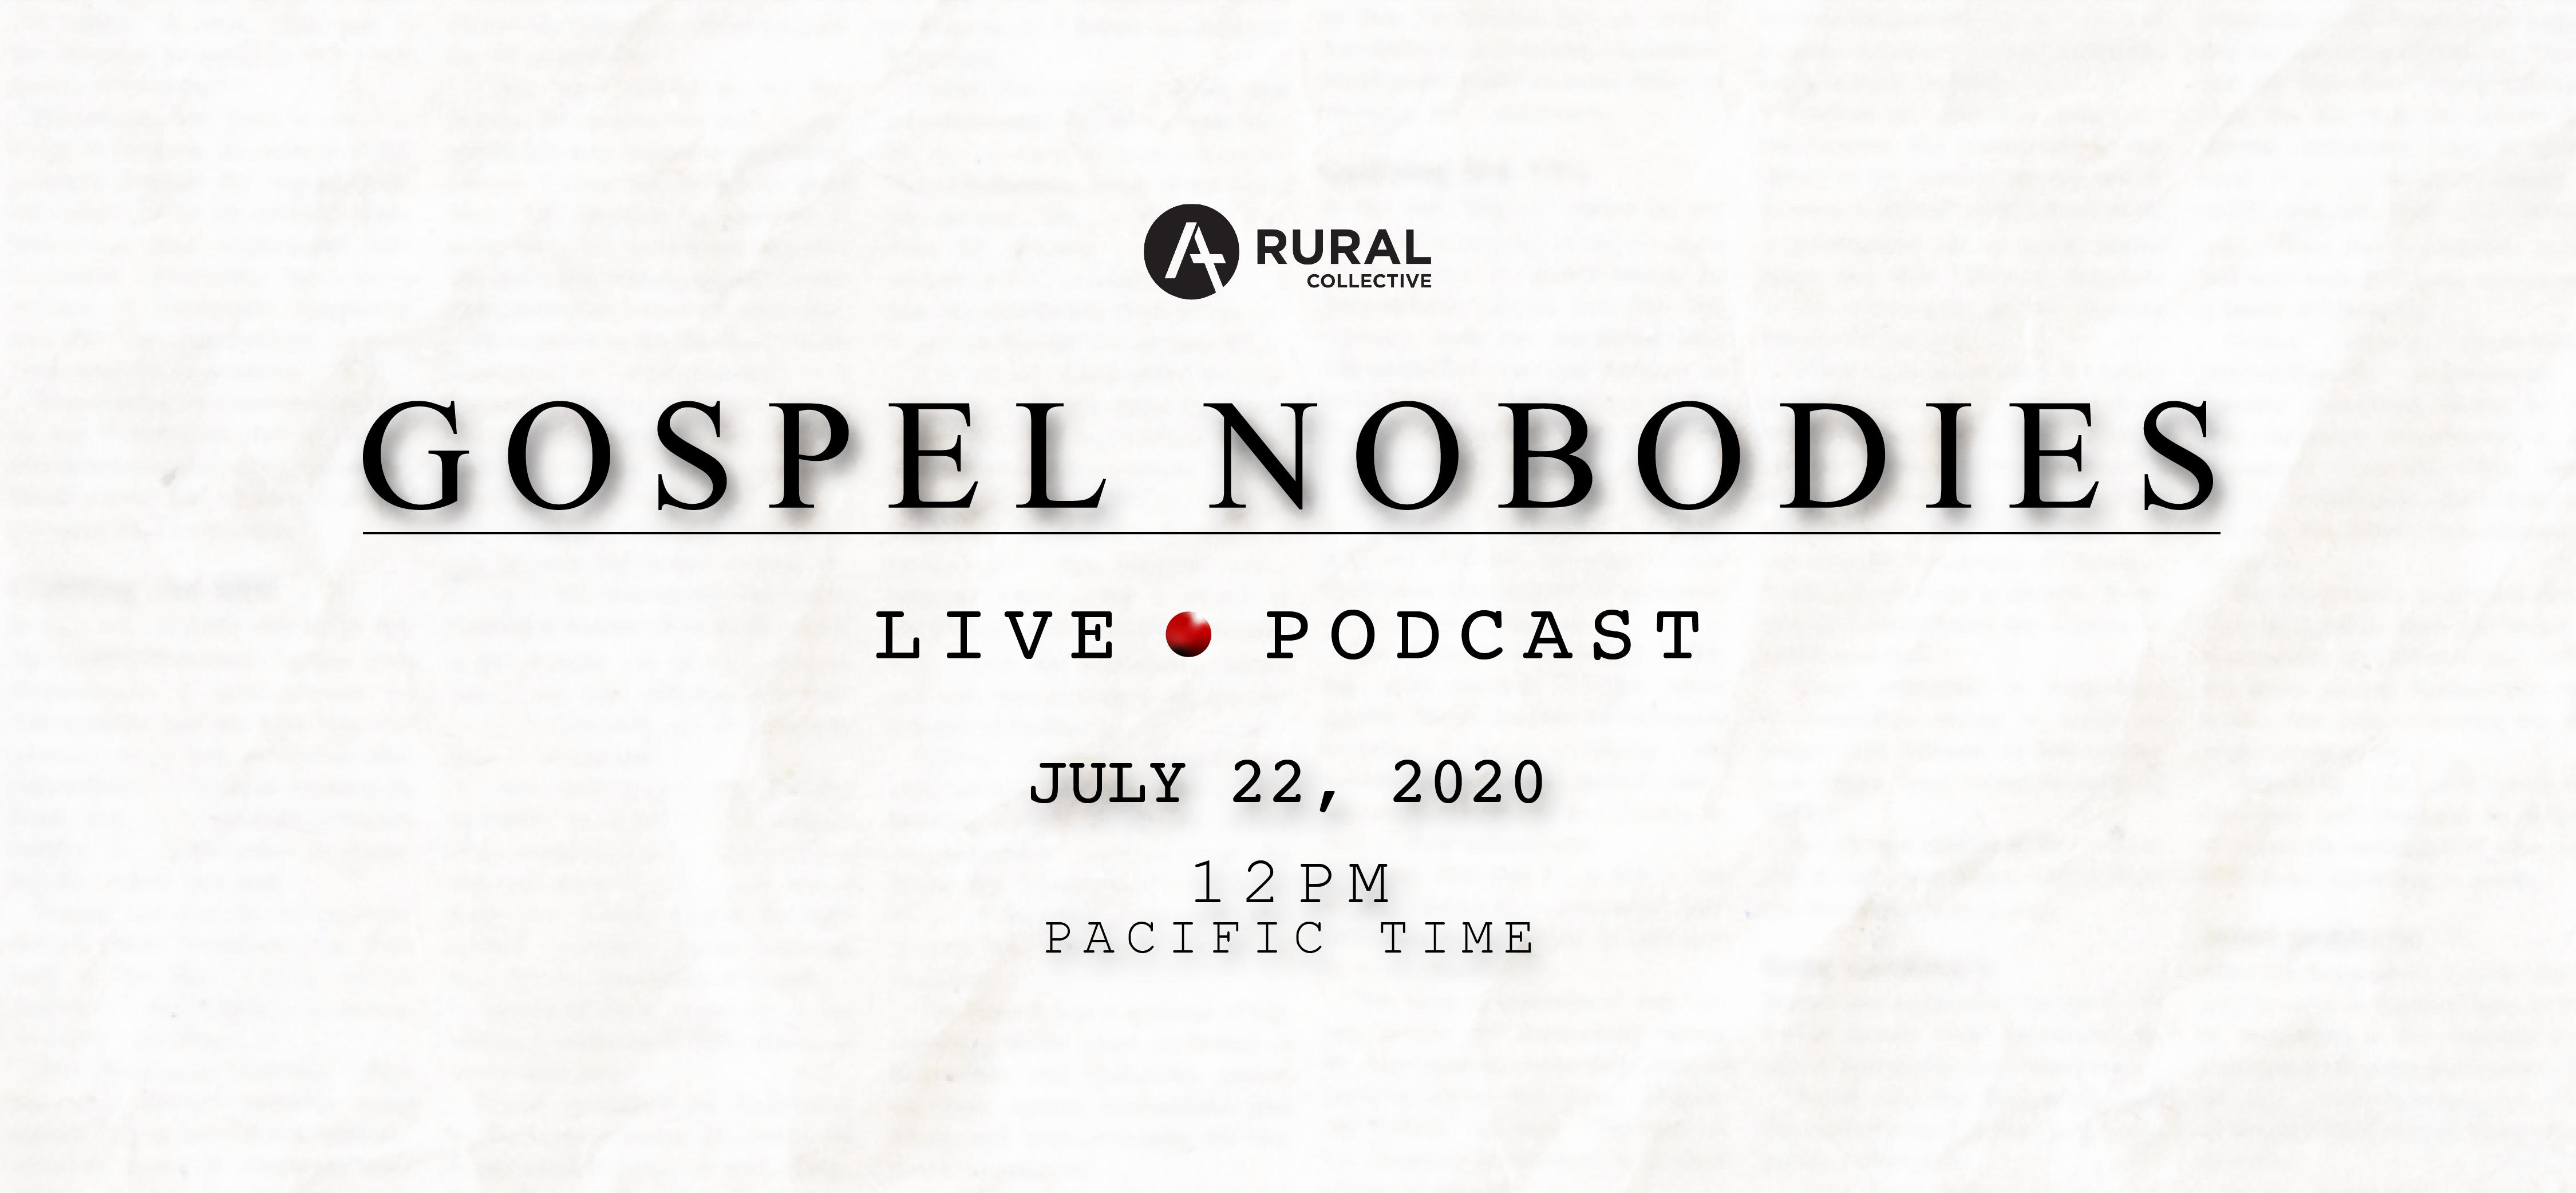 Gospel Nobodies Podcast